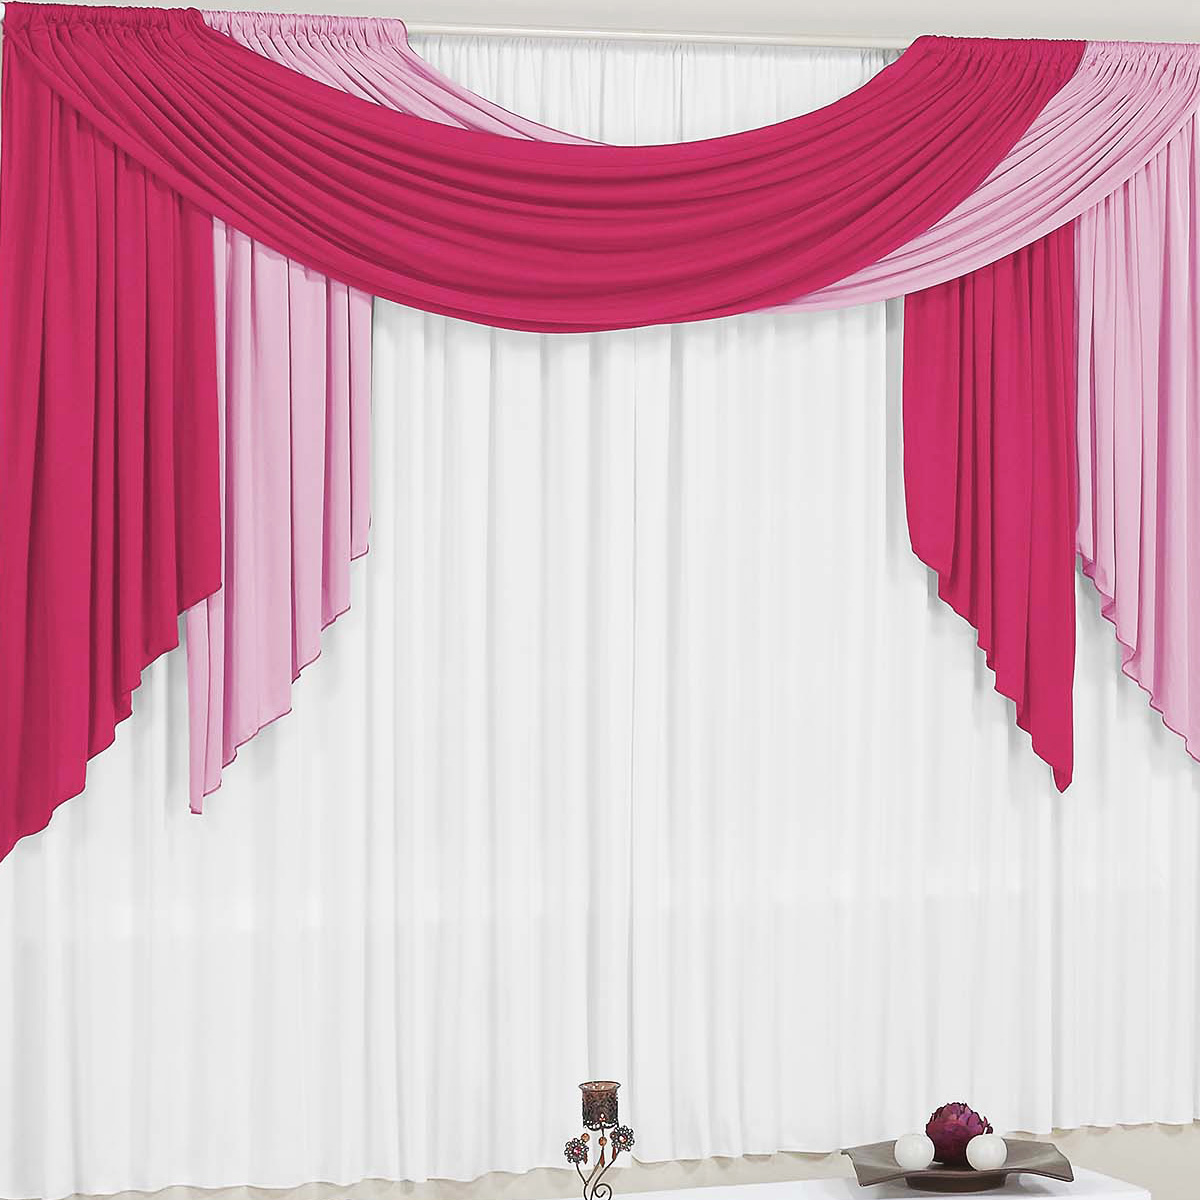 Cortina para sala e quarto pink e rosa e branco 4 metros for Argollas de plastico para cortinas